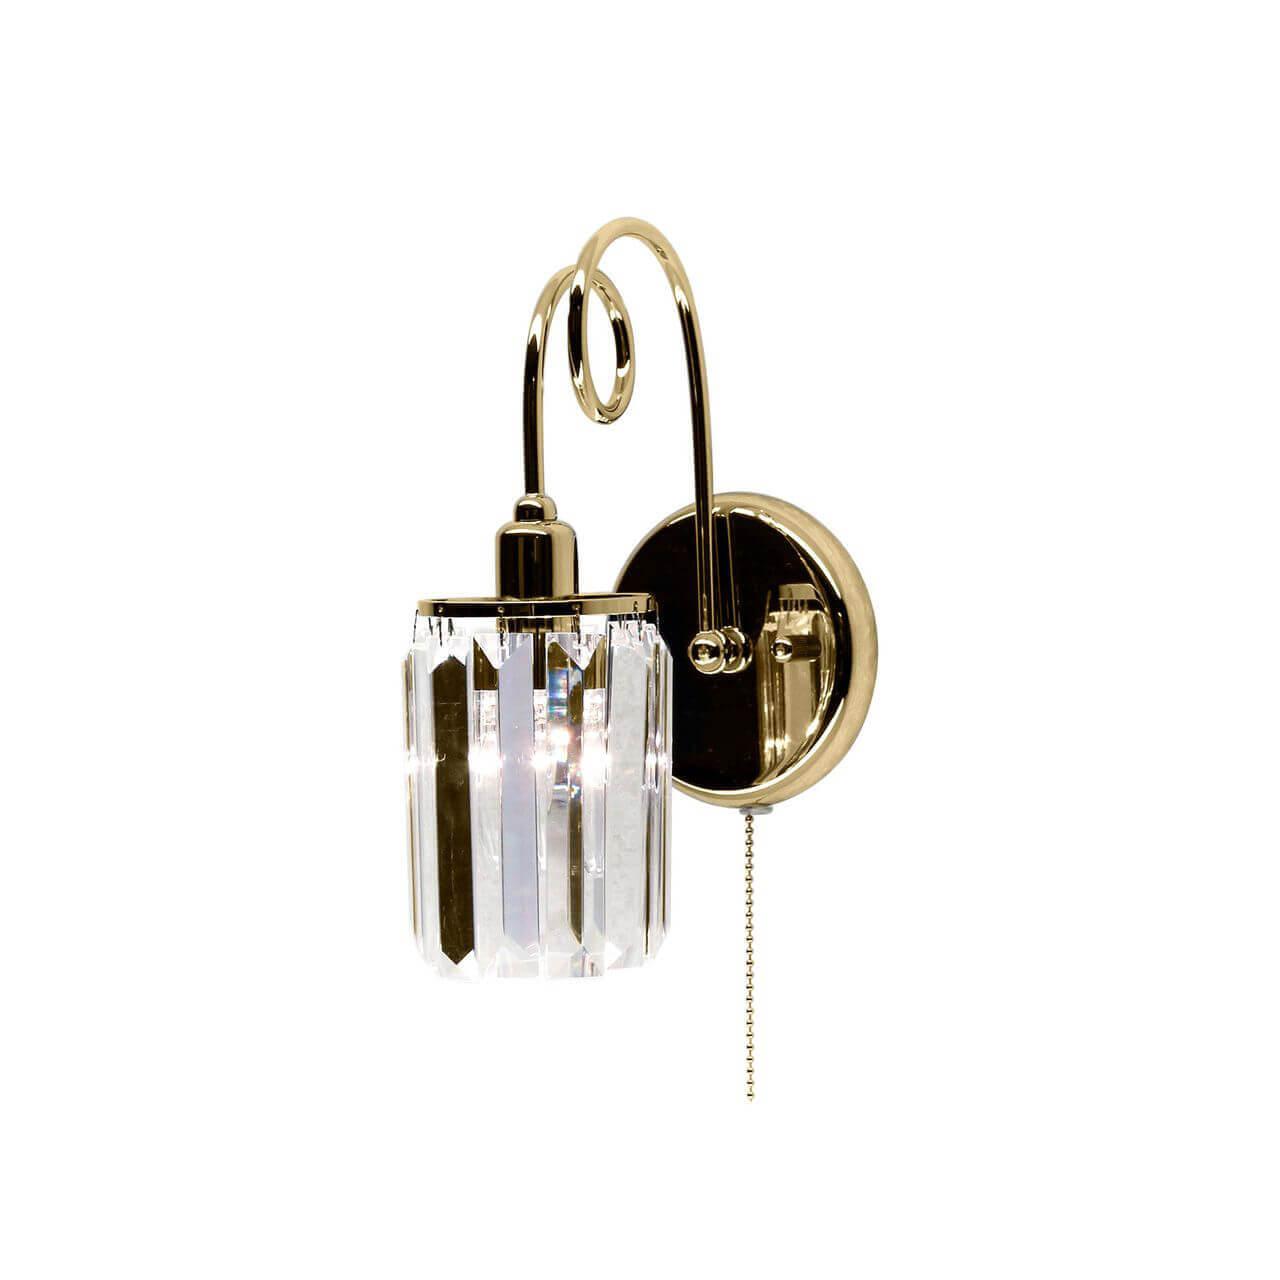 Бра Citilux CL330312 Синди Золото triton синди 125x125